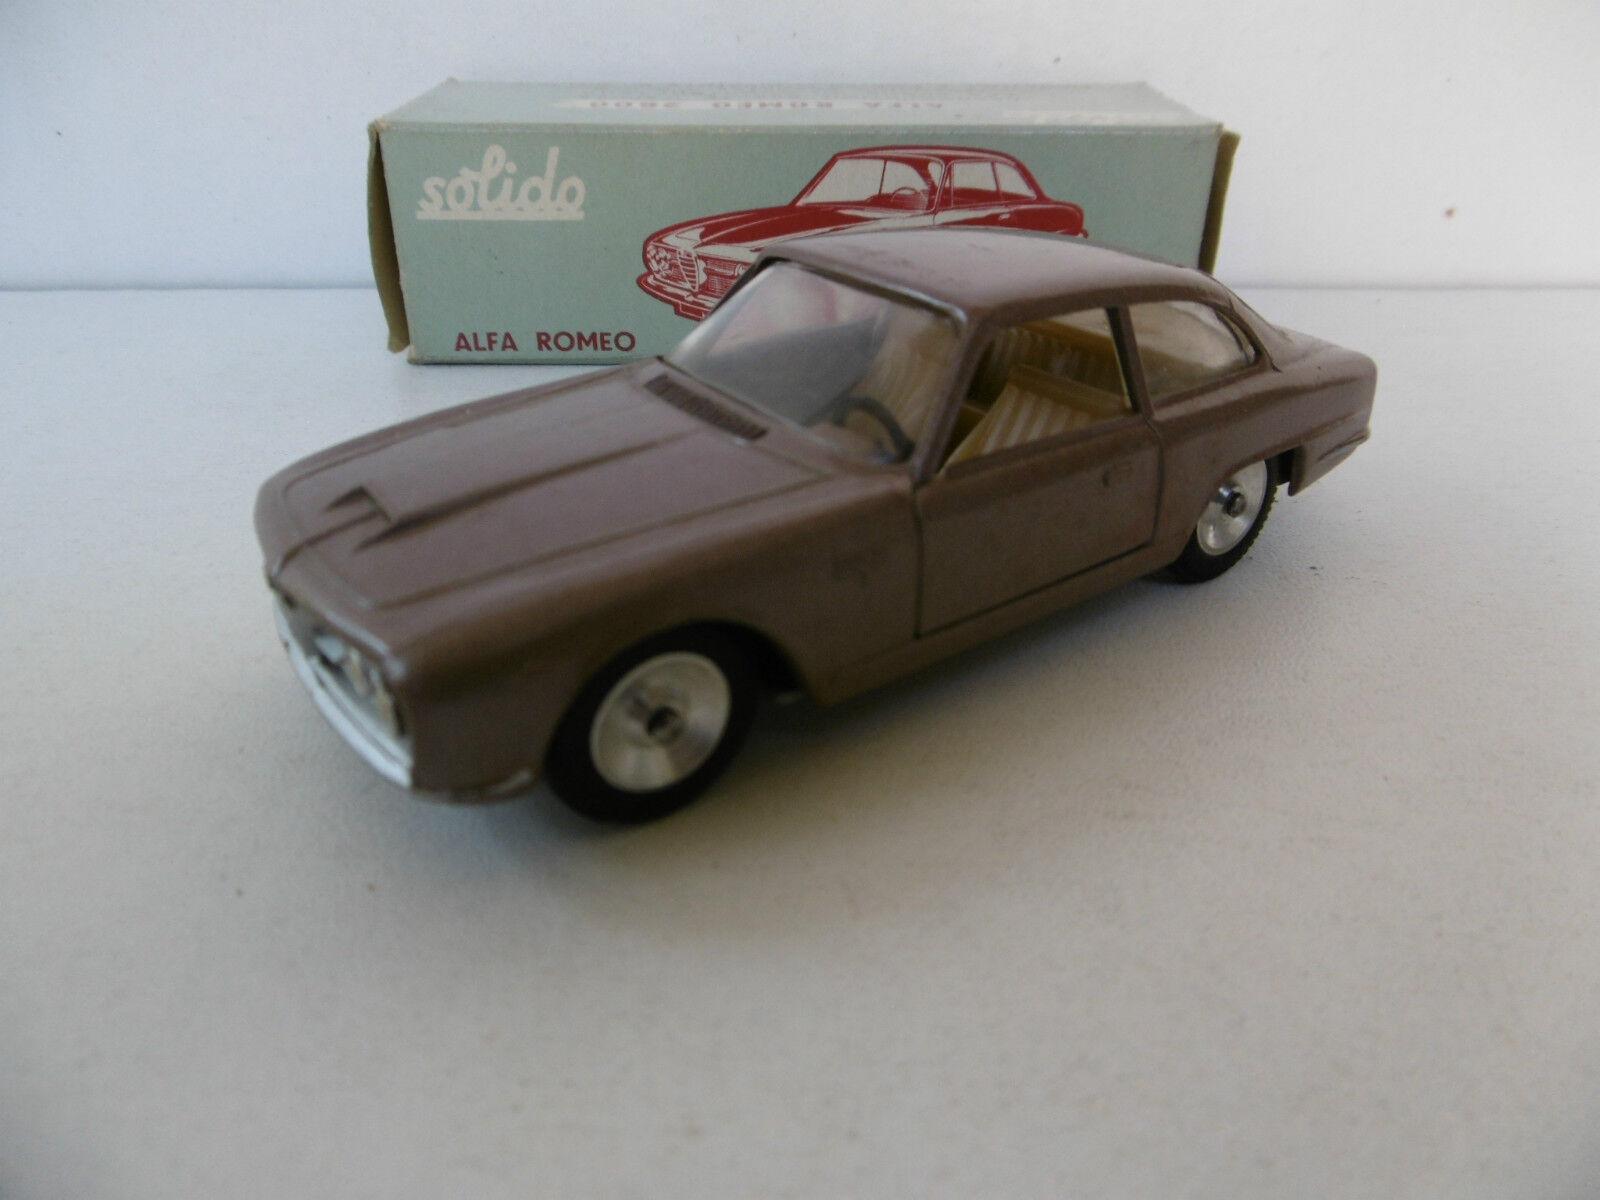 SOLIDO  SÉRIE 100  ALFA-ROMEO 2600 2600 2600 BERTONE   1963  BEL ÉTAT  BOITE D'ORIGINE   Up-to-date Styling  be594d